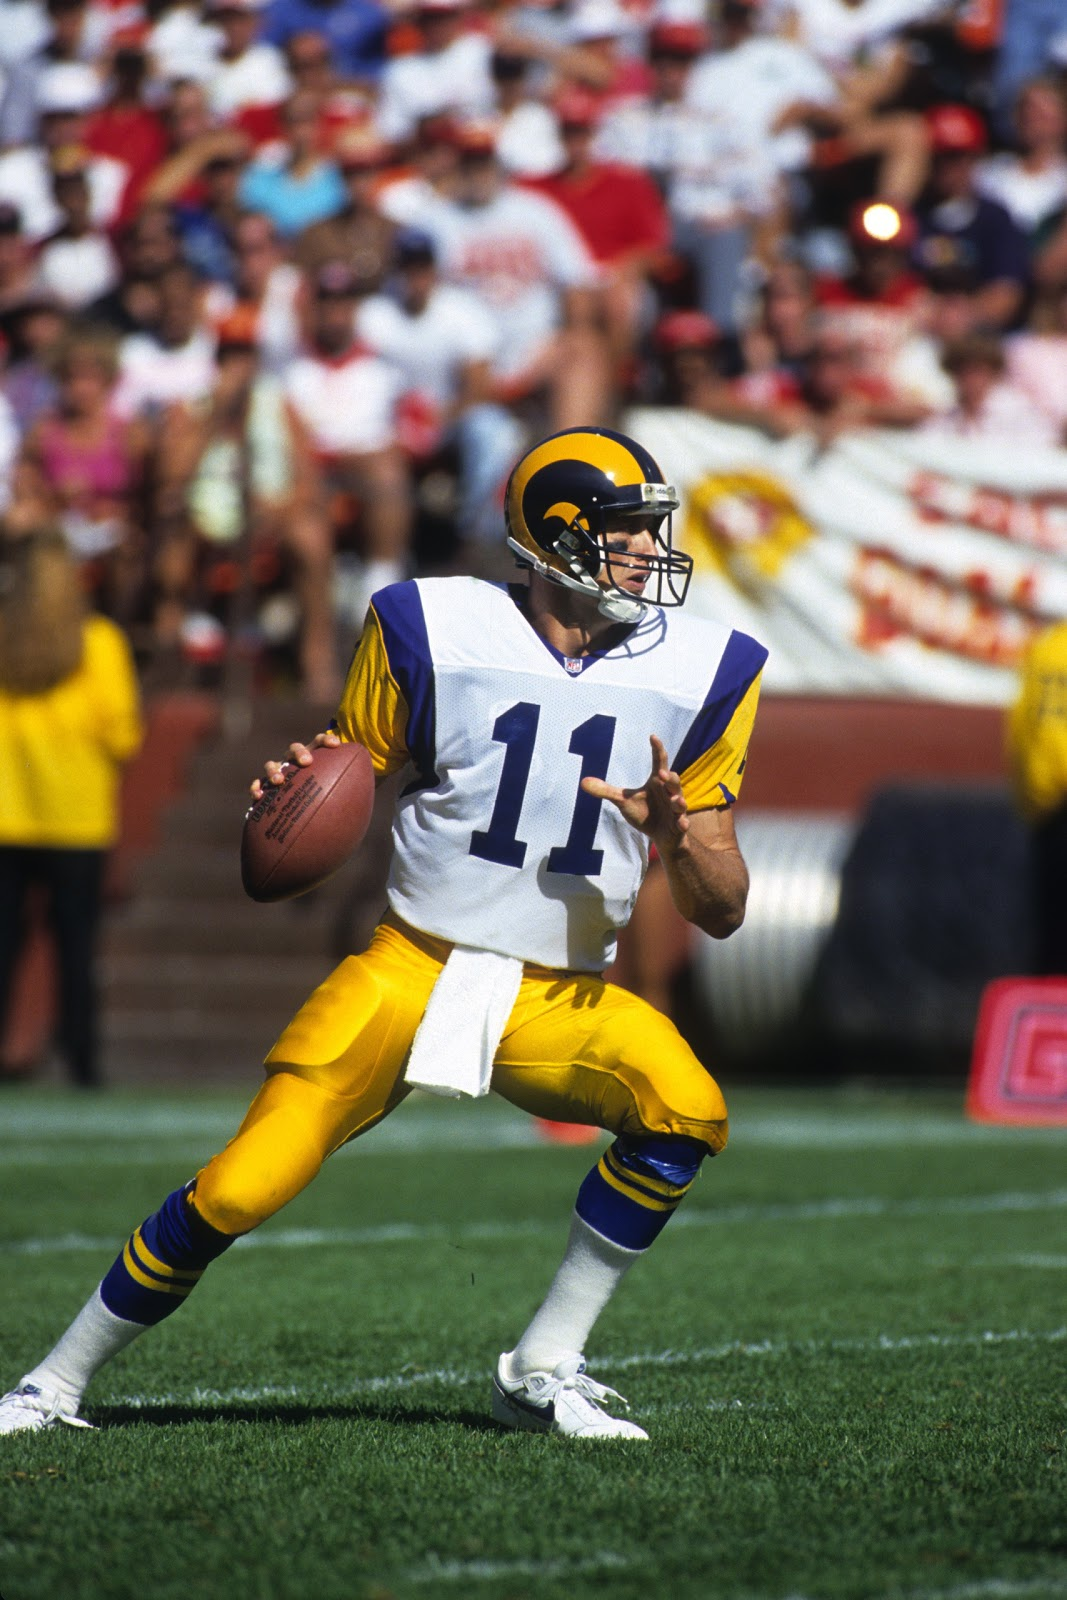 Patti's Ramblings: Jim Everett QB LA Rams Where Are They Now?